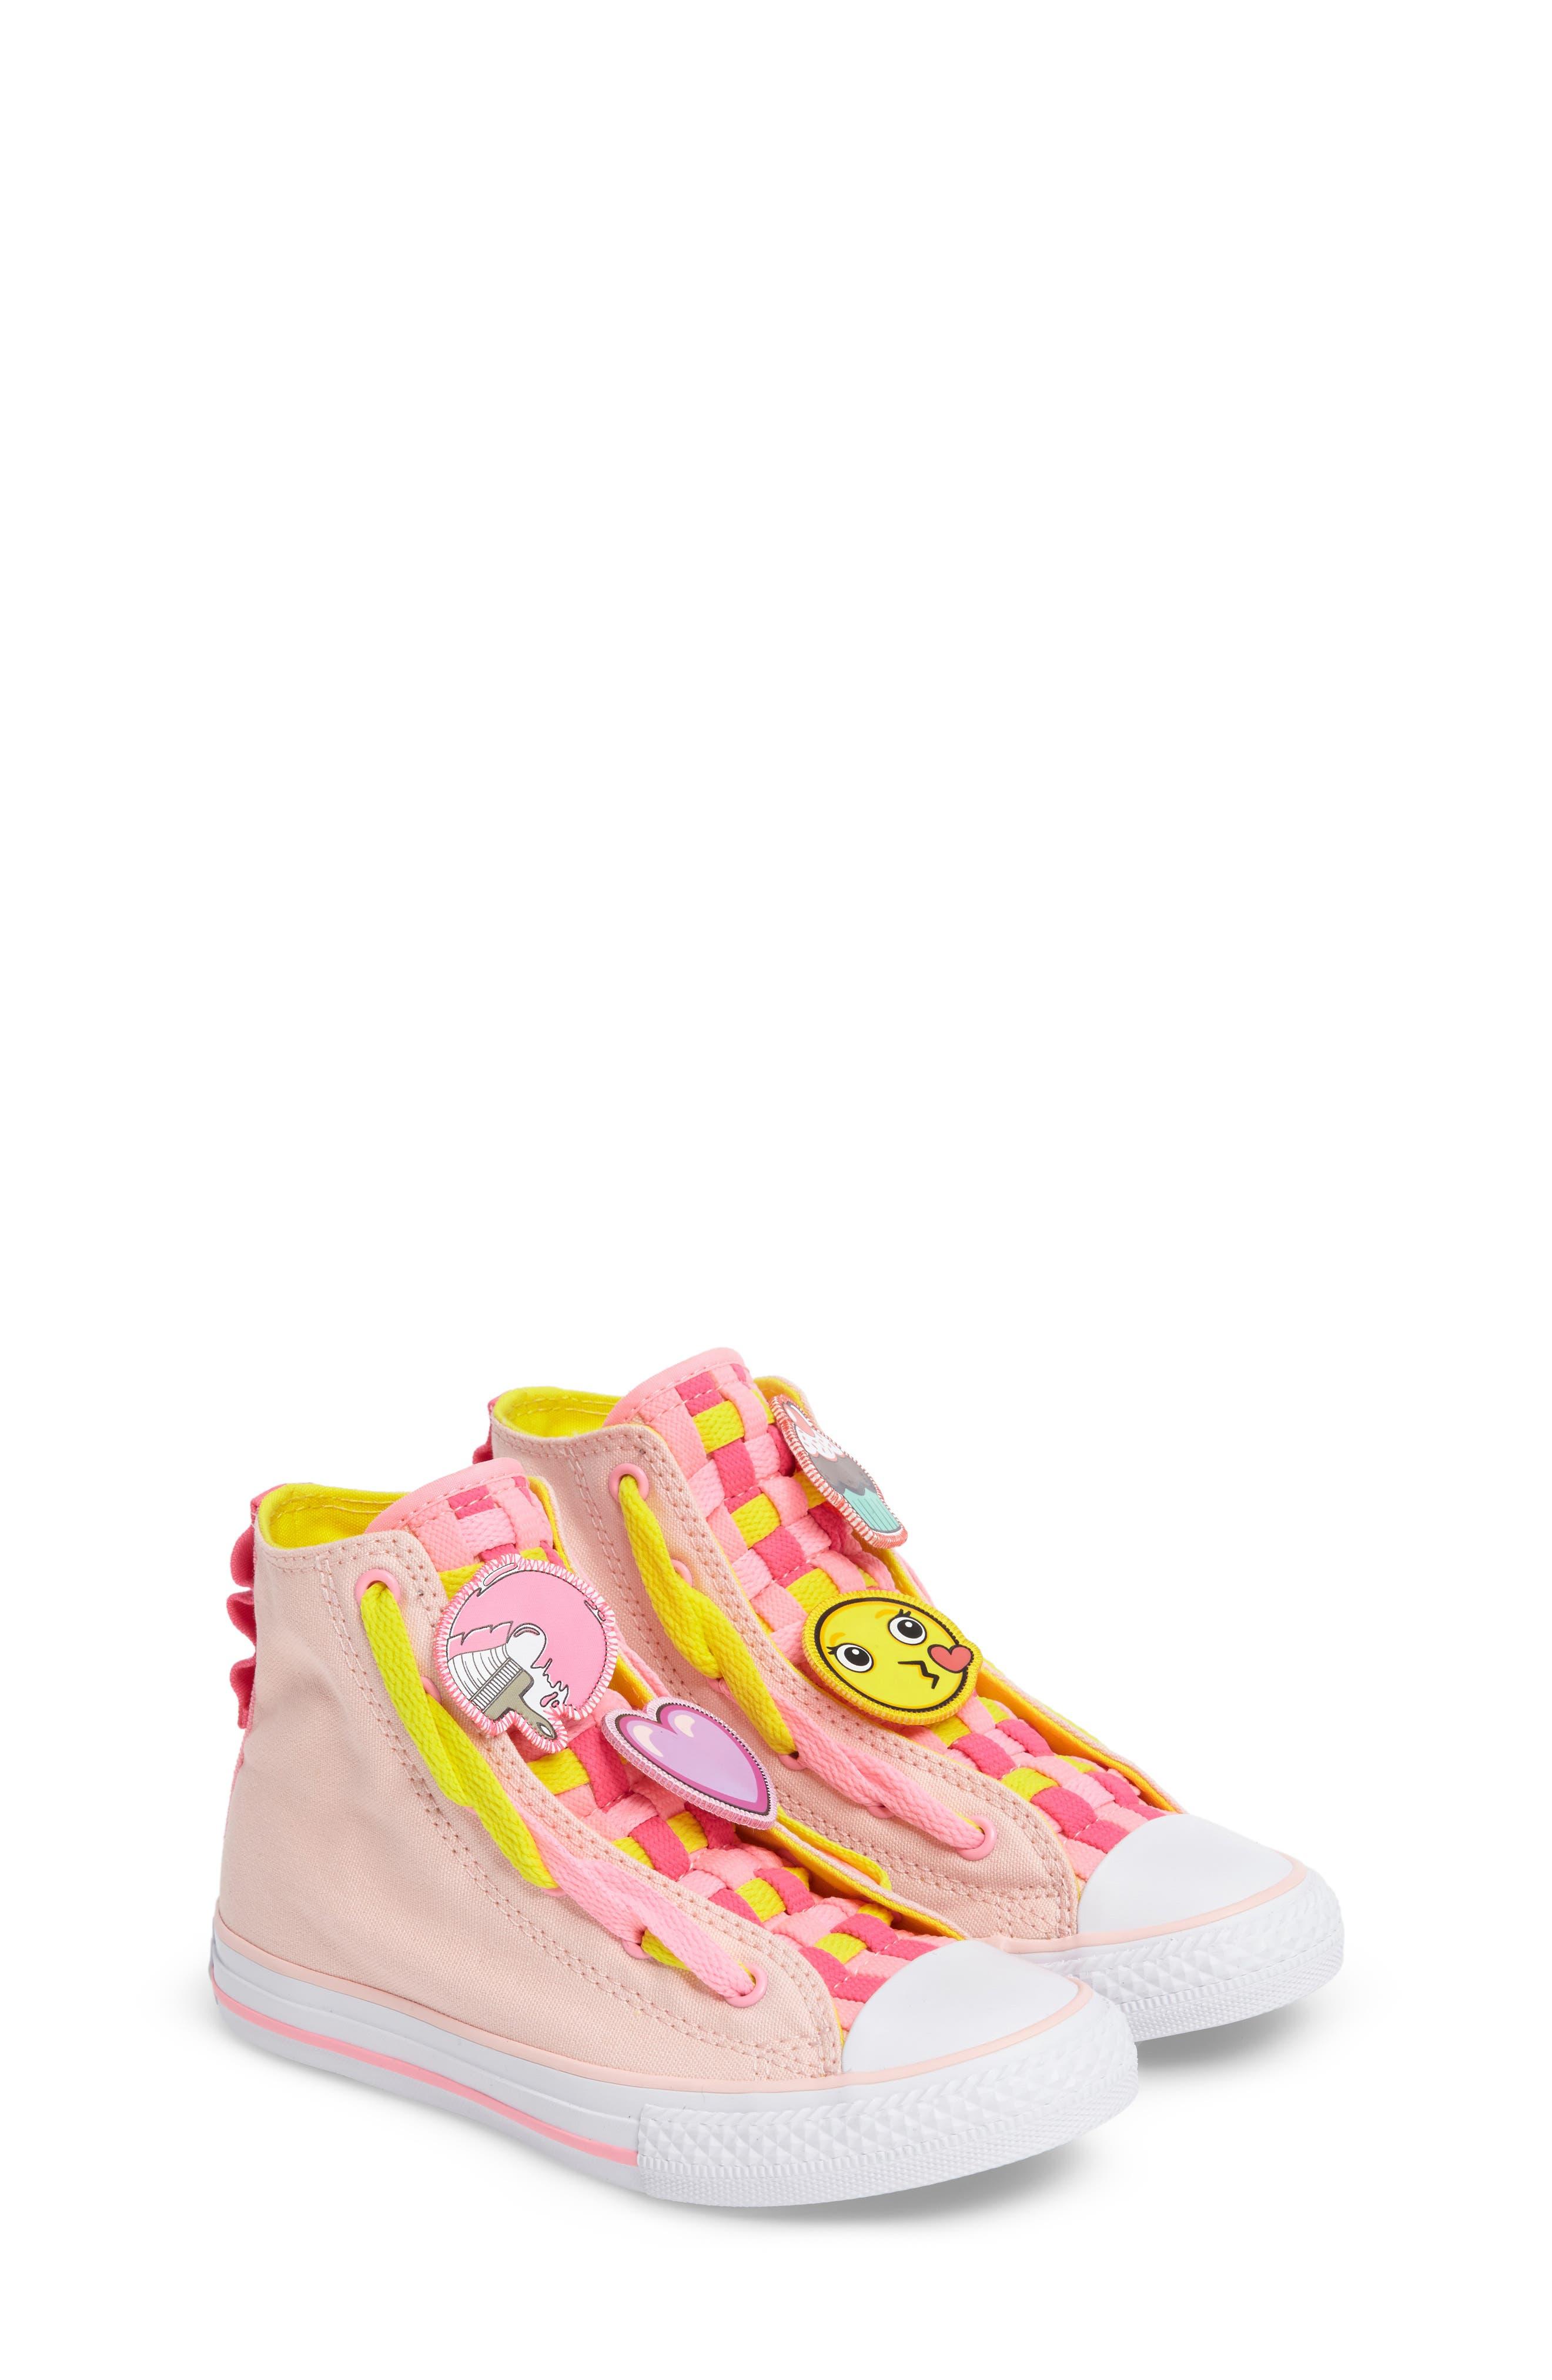 Converse Chuck Taylor® All Star® Loopholes Emoji Sneaker (Toddler, Little Kid & Big Kid)